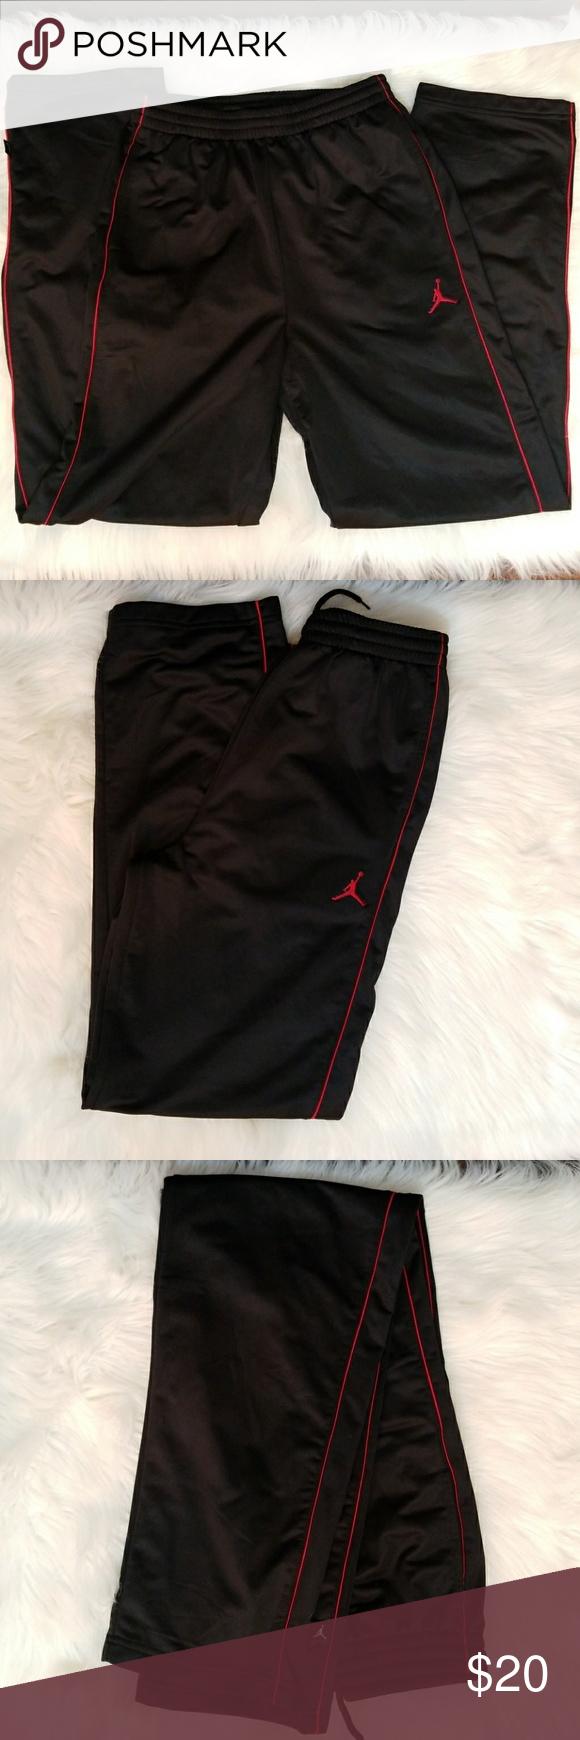 11ee9b7e254f6c Jordan Track Jogging Pants (Youth XL) Jordan Black with Red Track Jogging  Pants. Youth XL 13-15 yrs 158 - 170 CM as seen in photo. Worn 1 - 2 times.